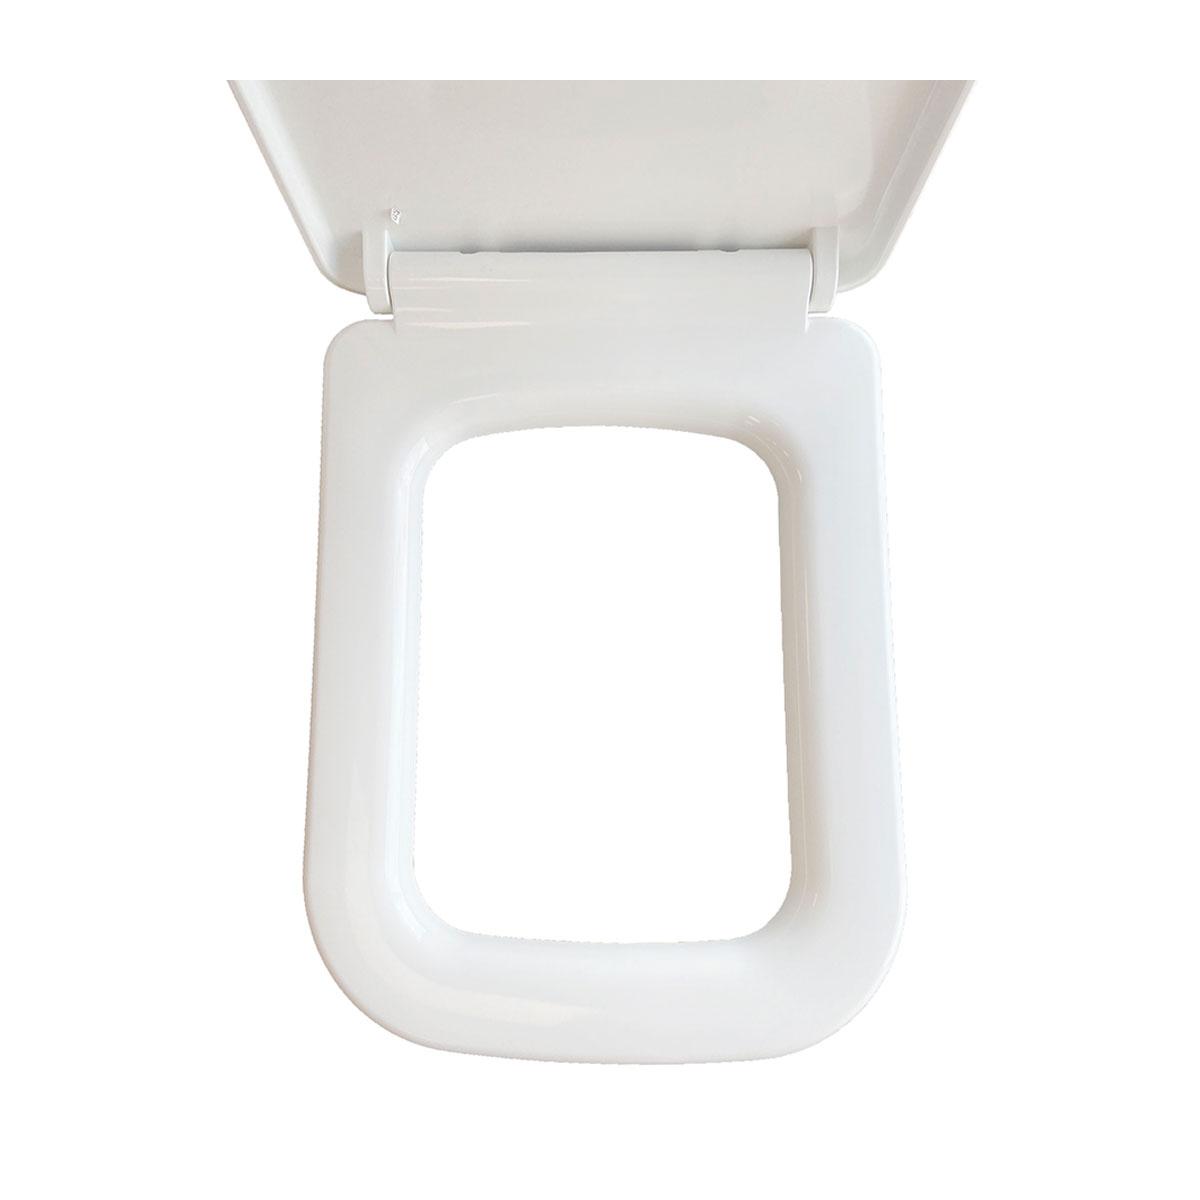 Toiletbril Wiesbaden Carré Softclose en Quickrelease Toiletzitting Wit